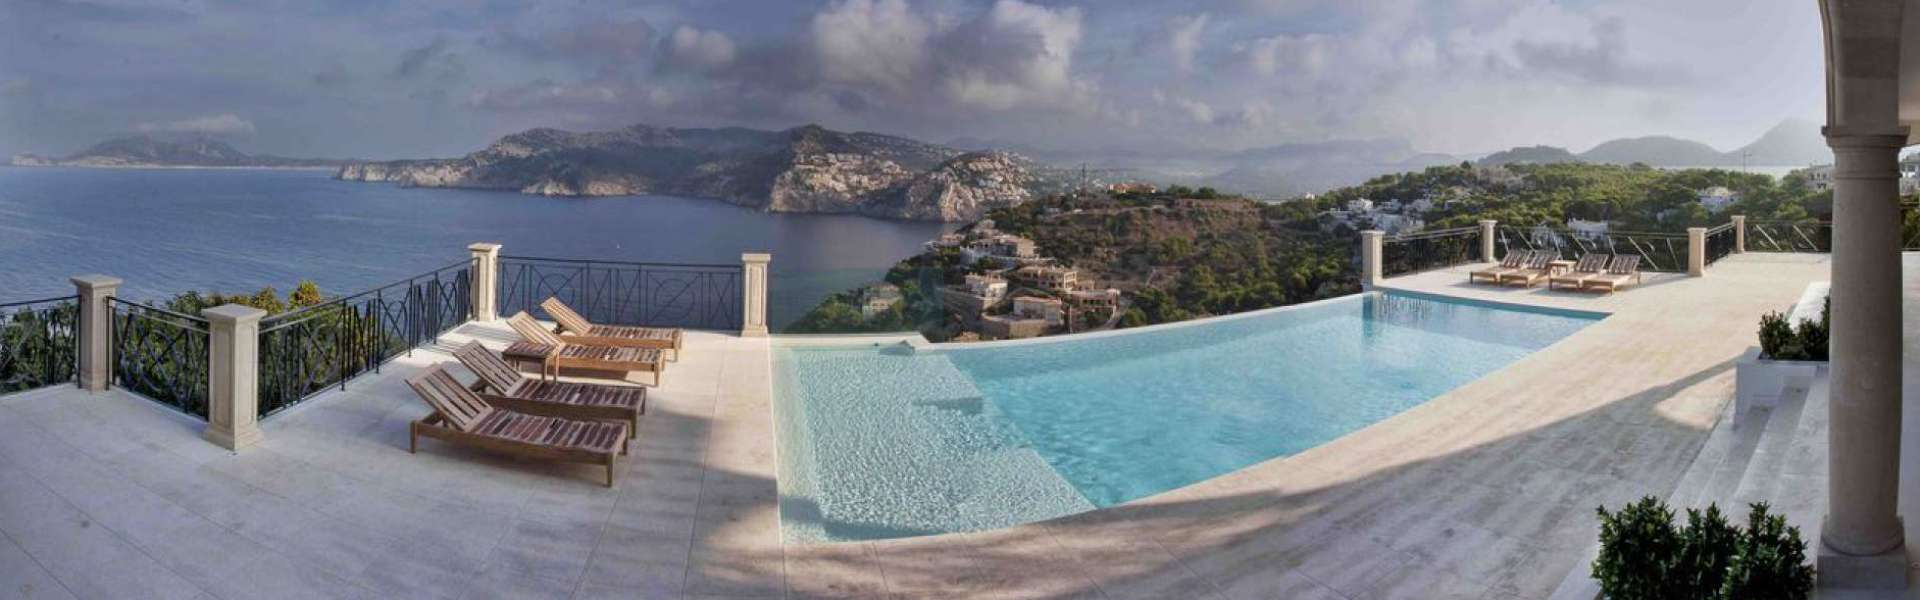 Port Andratx - Modern luxury villa in Top Position